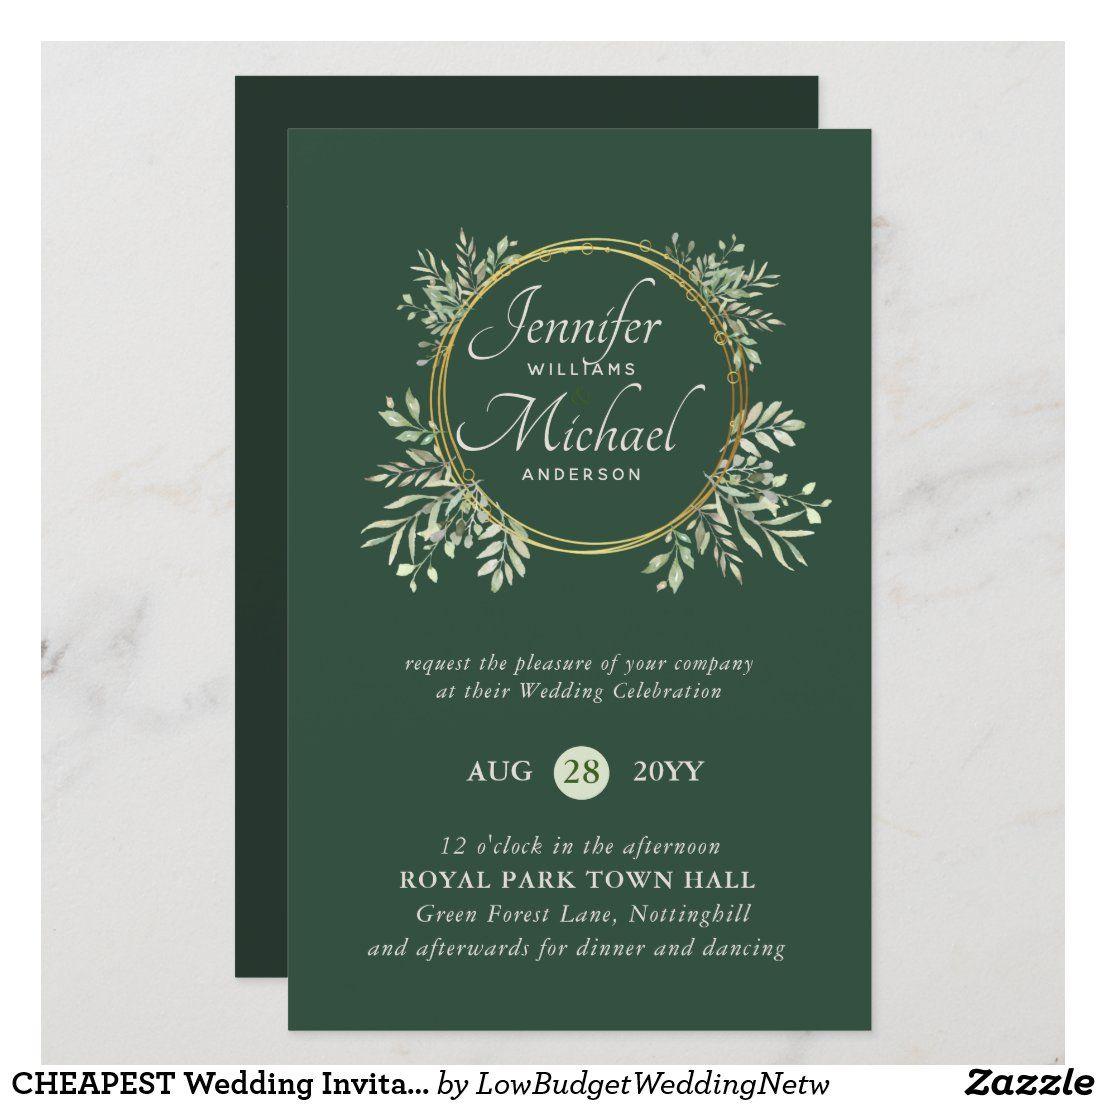 Cheapest Wedding Invitation Greenery Wreath Budget In 2021 Cheap Wedding Invitations Budget Wedding Invitations Wedding Invitations